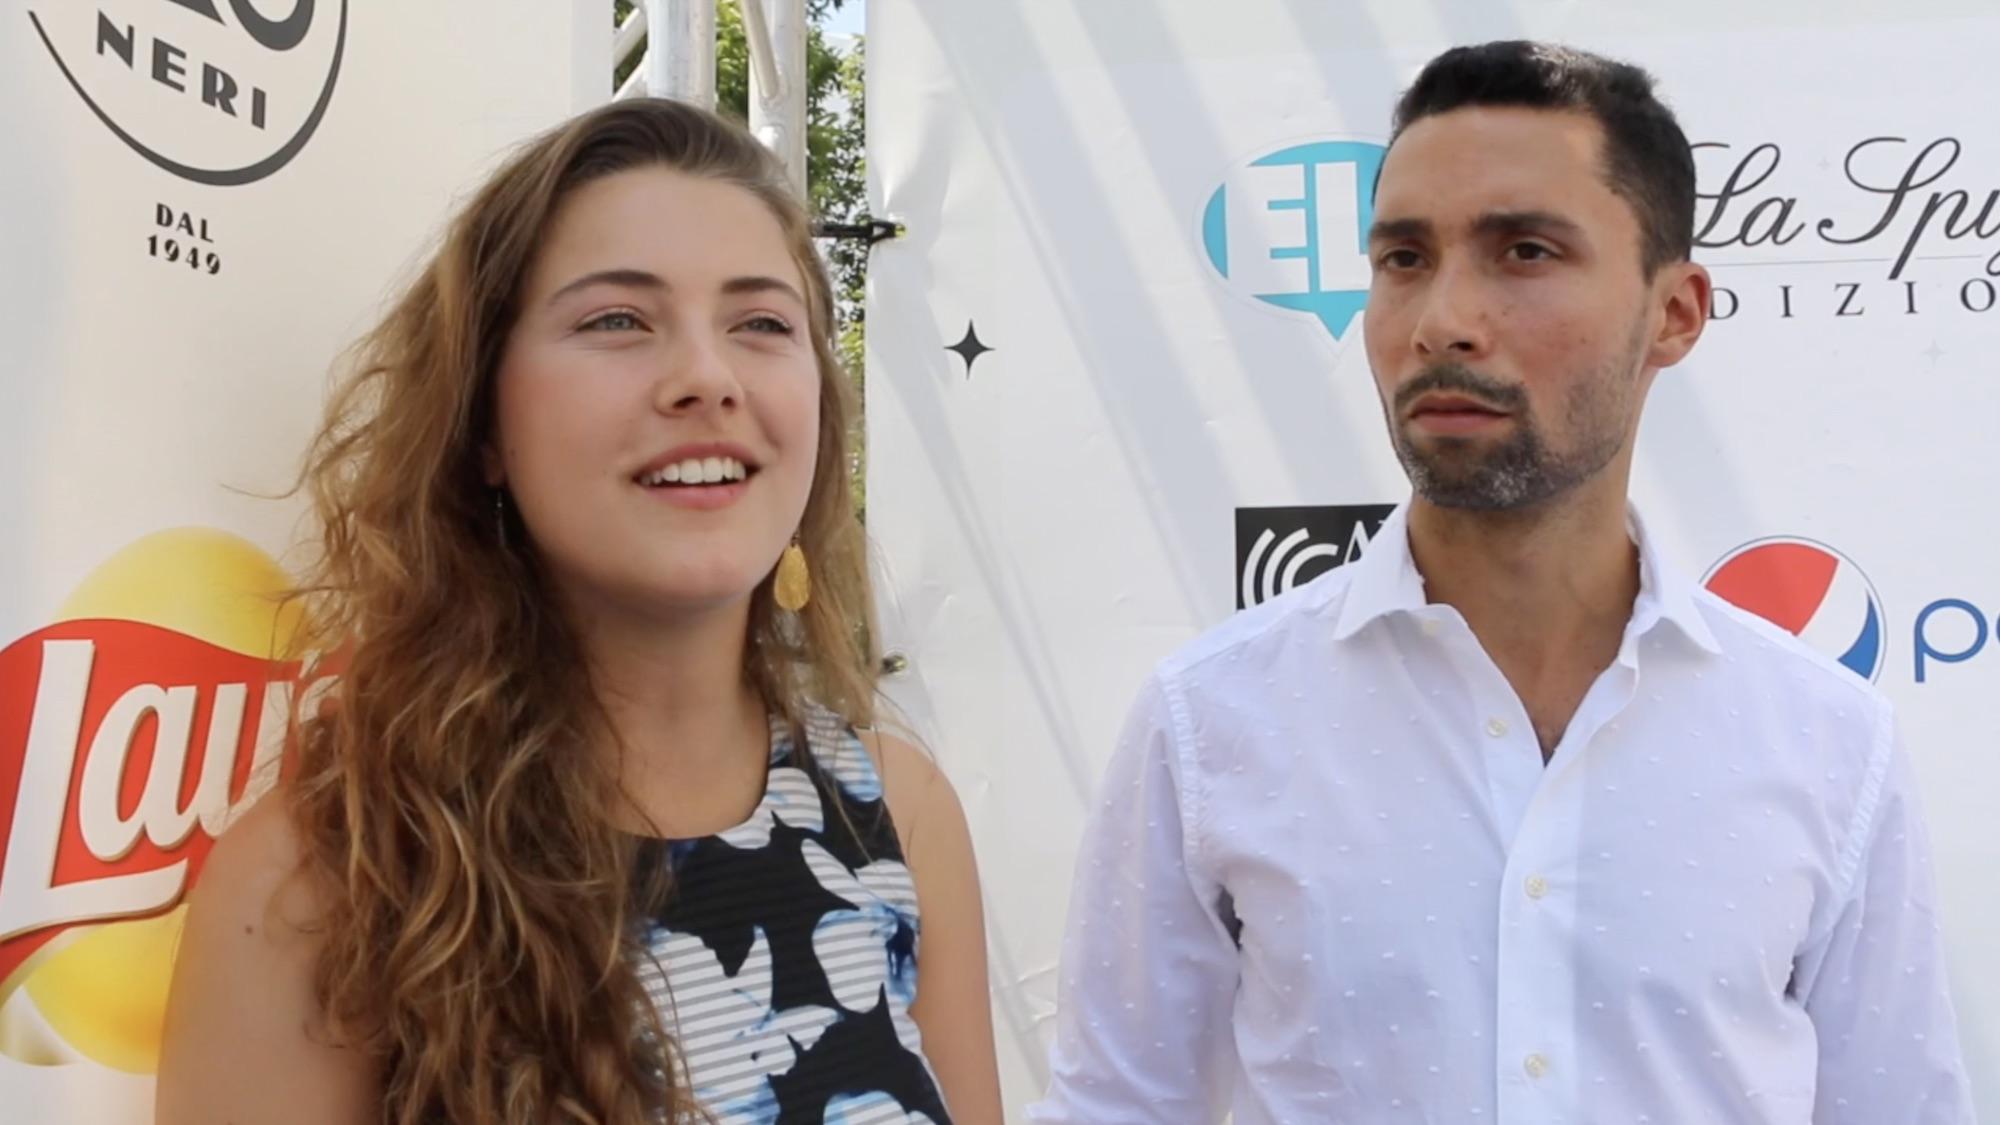 #Goldfish: la video intervista al regista Giacomo Arrigoni e alla protagonista Sofia Panizzi